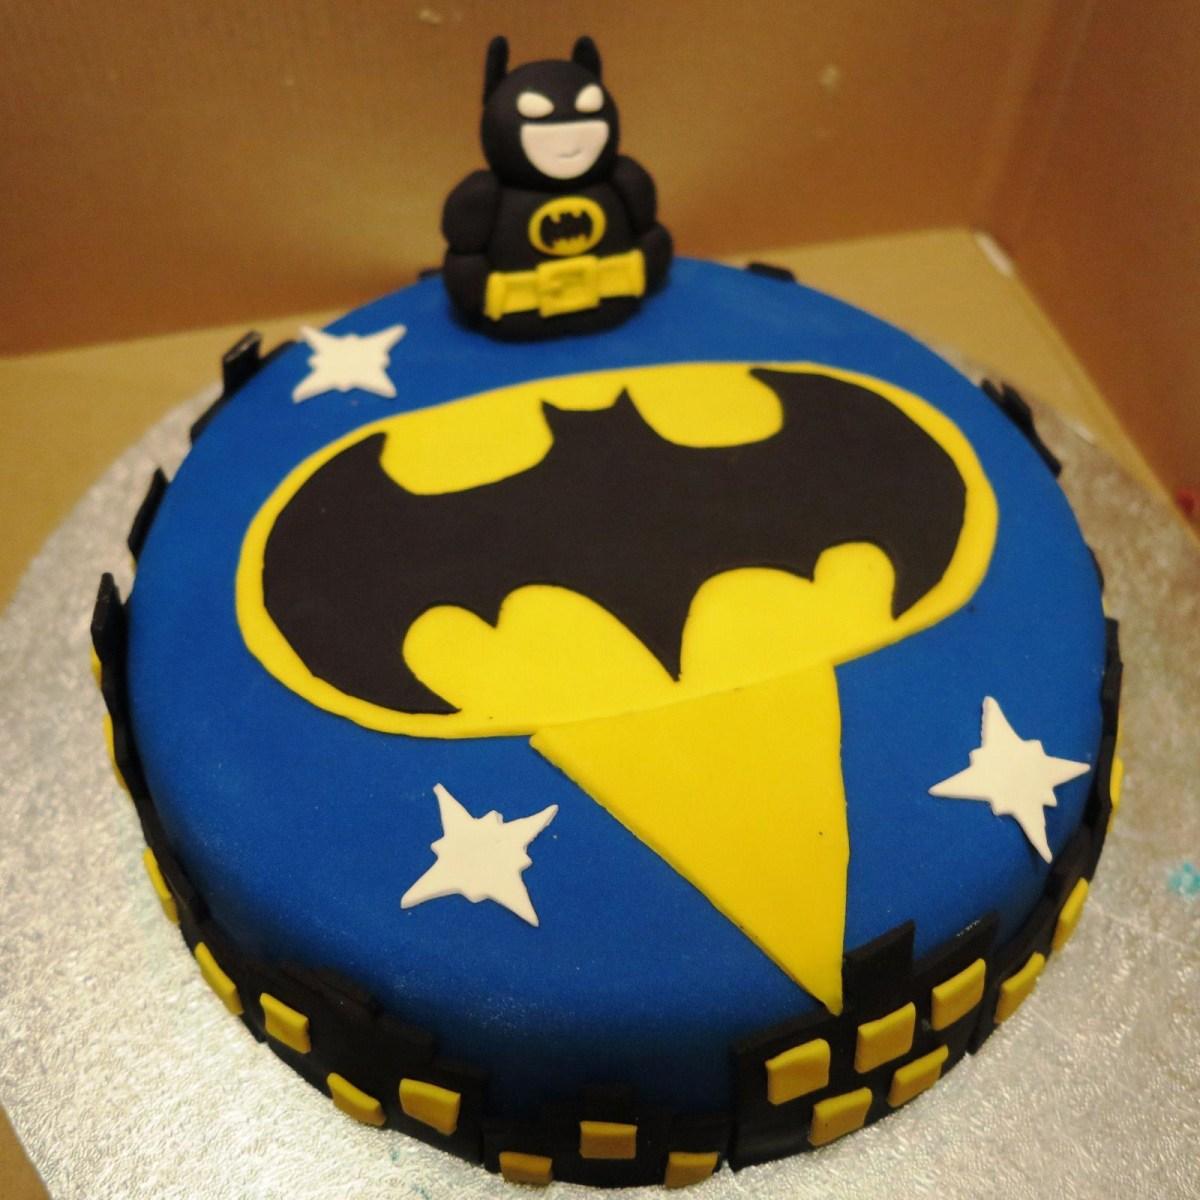 Surprising Batman Birthday Cakes Batman Birthday Cake Coolest And Simple Funny Birthday Cards Online Bapapcheapnameinfo